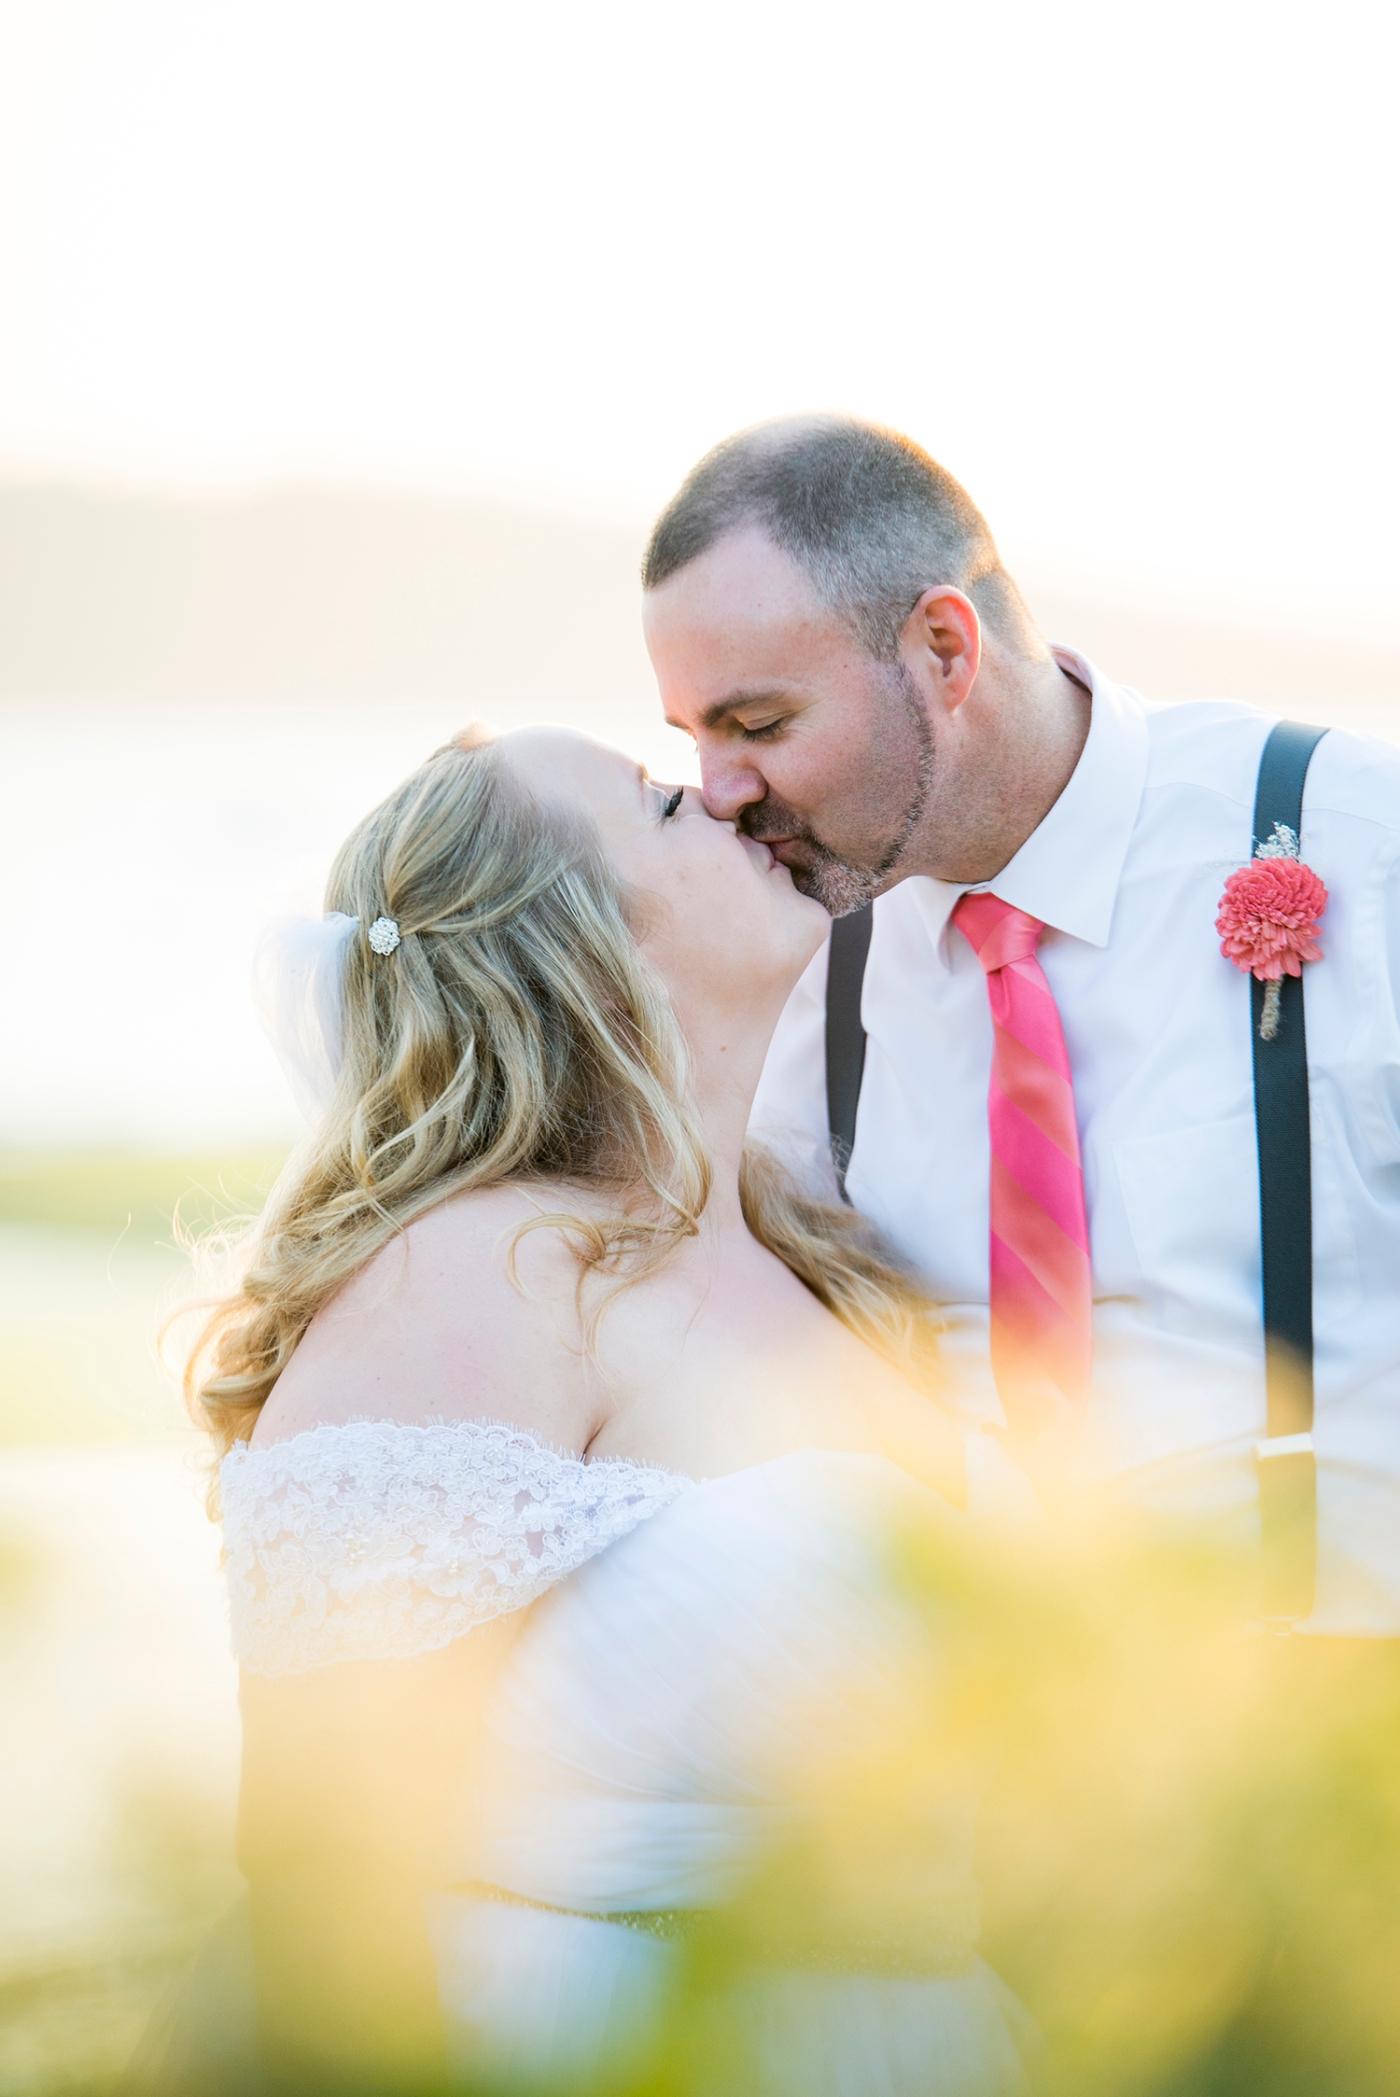 Jane_Speleers_photography_Kadie_and_Steve_2016_Des_Moines_Marina_WeddingDSC_2393